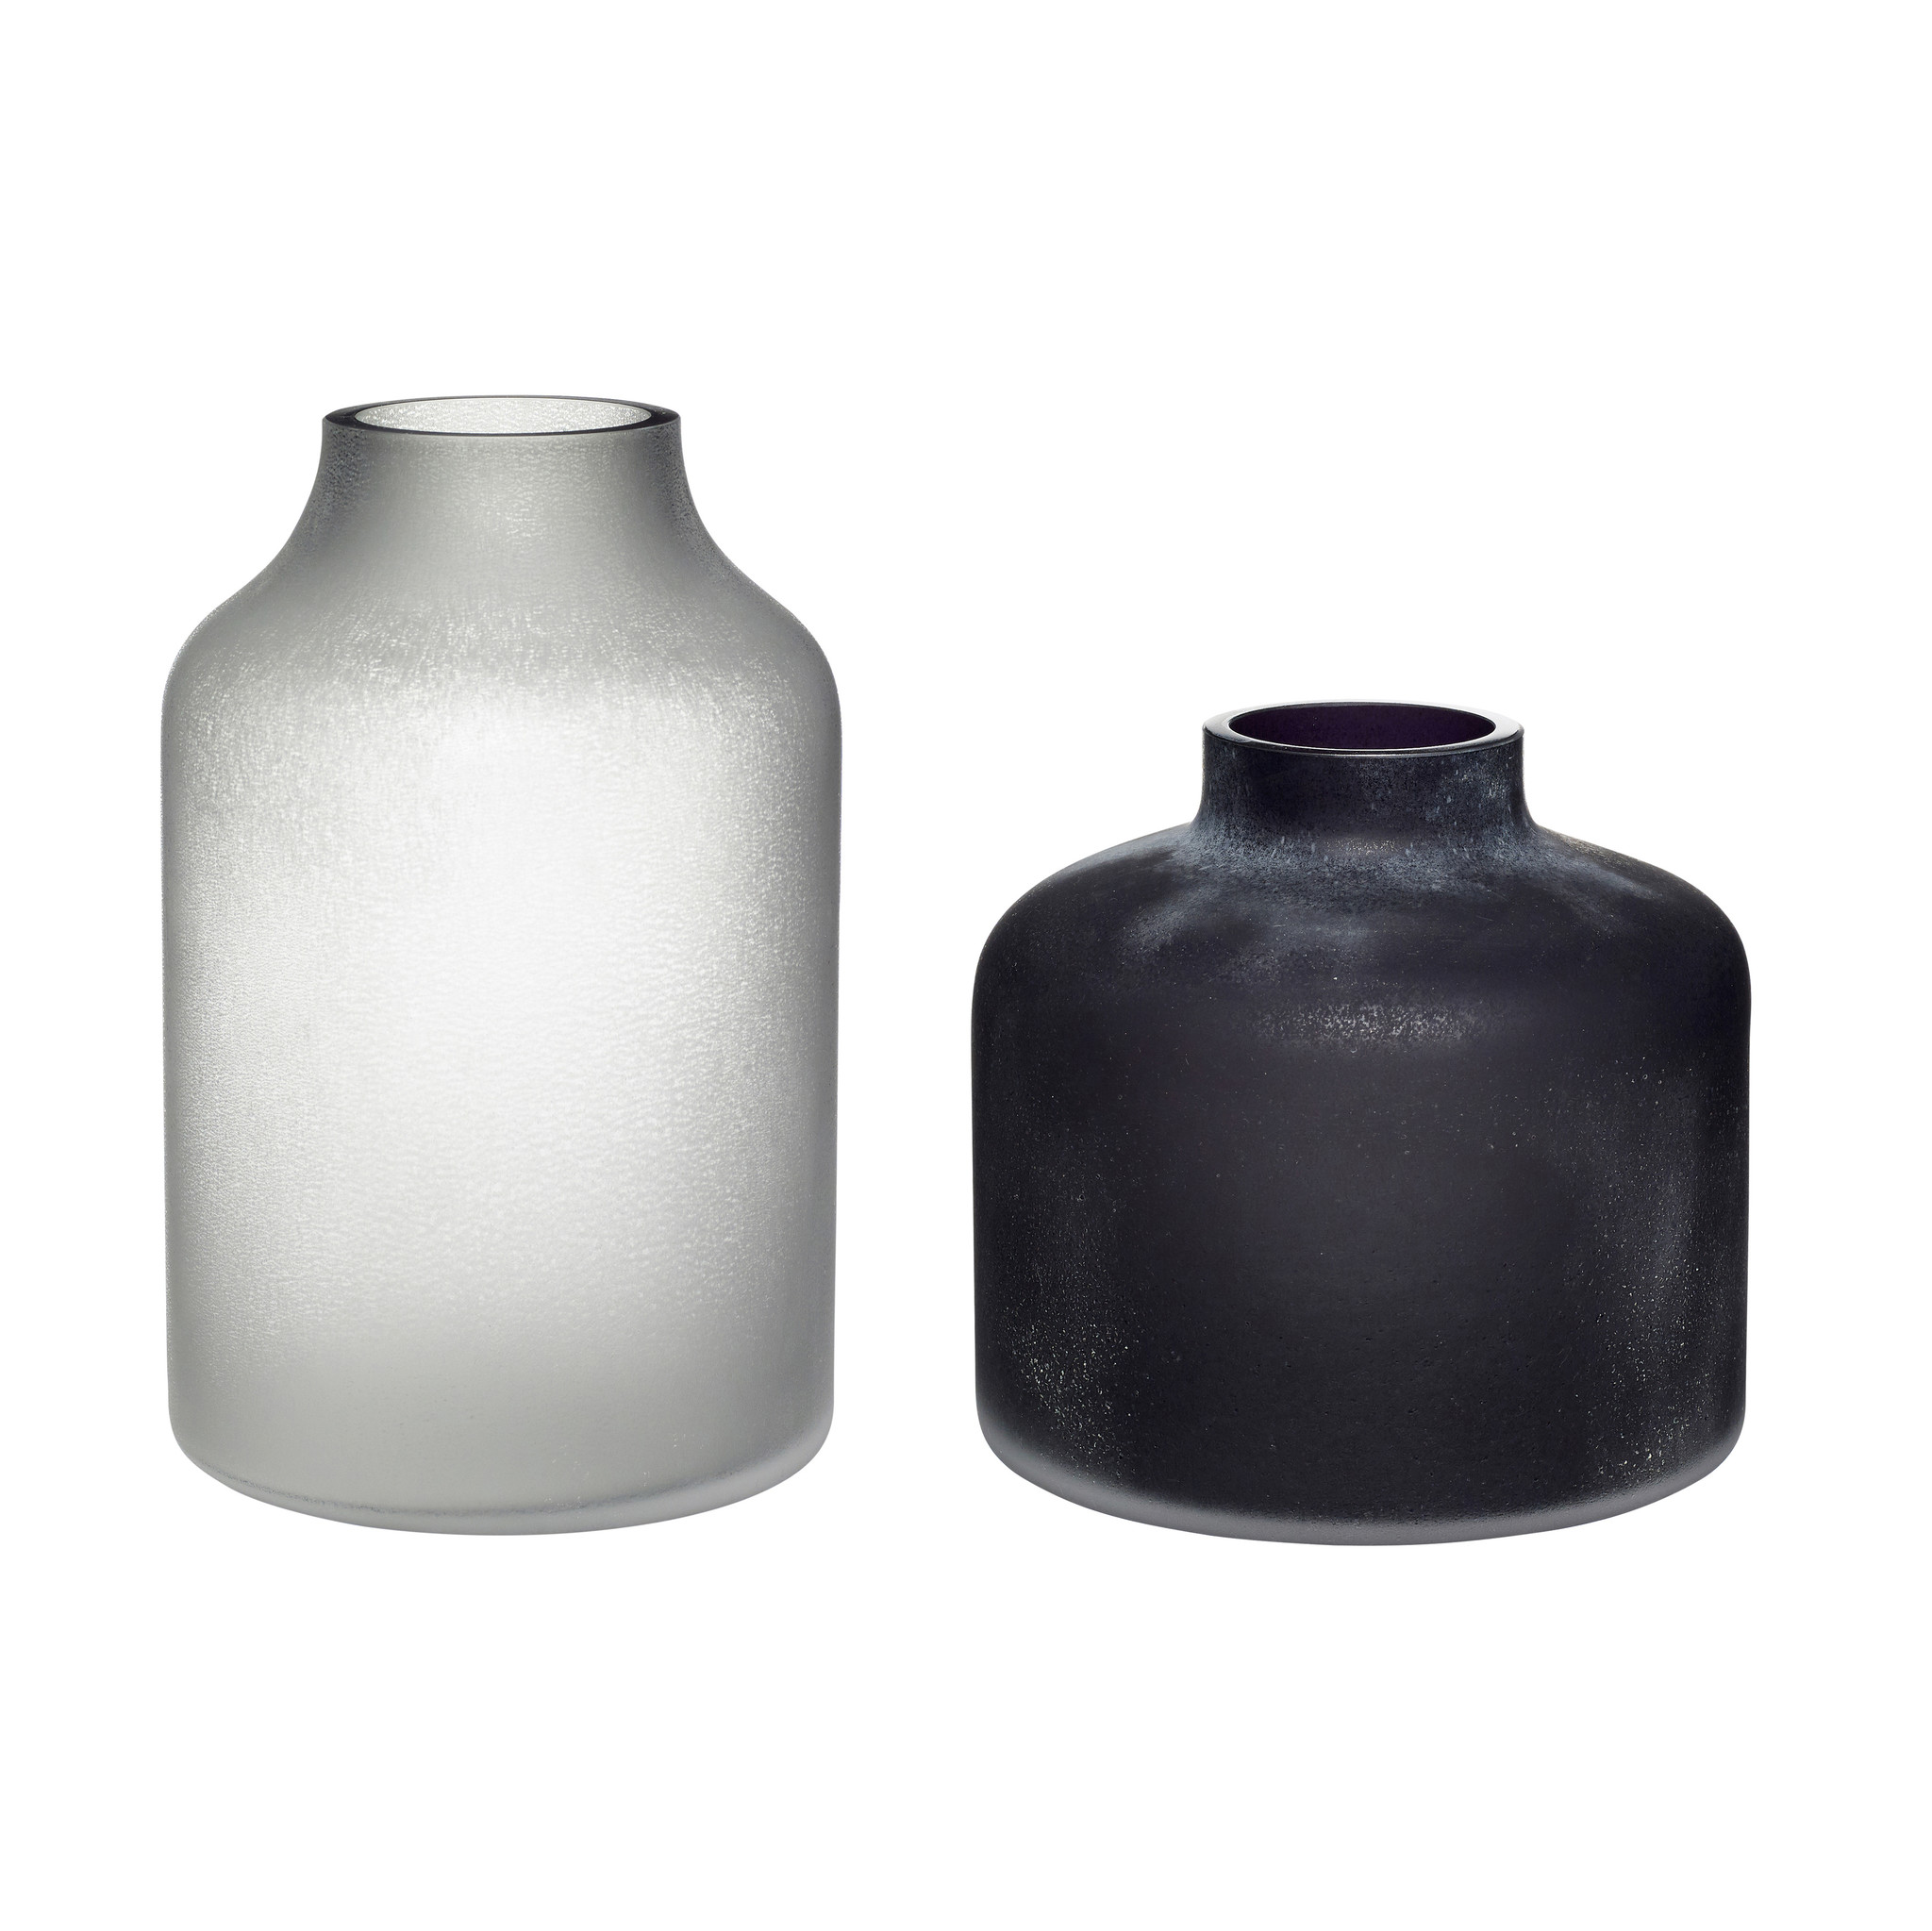 Hubsch Vaas, matglas, zwart / wit, set van 2-280802-5712772064672